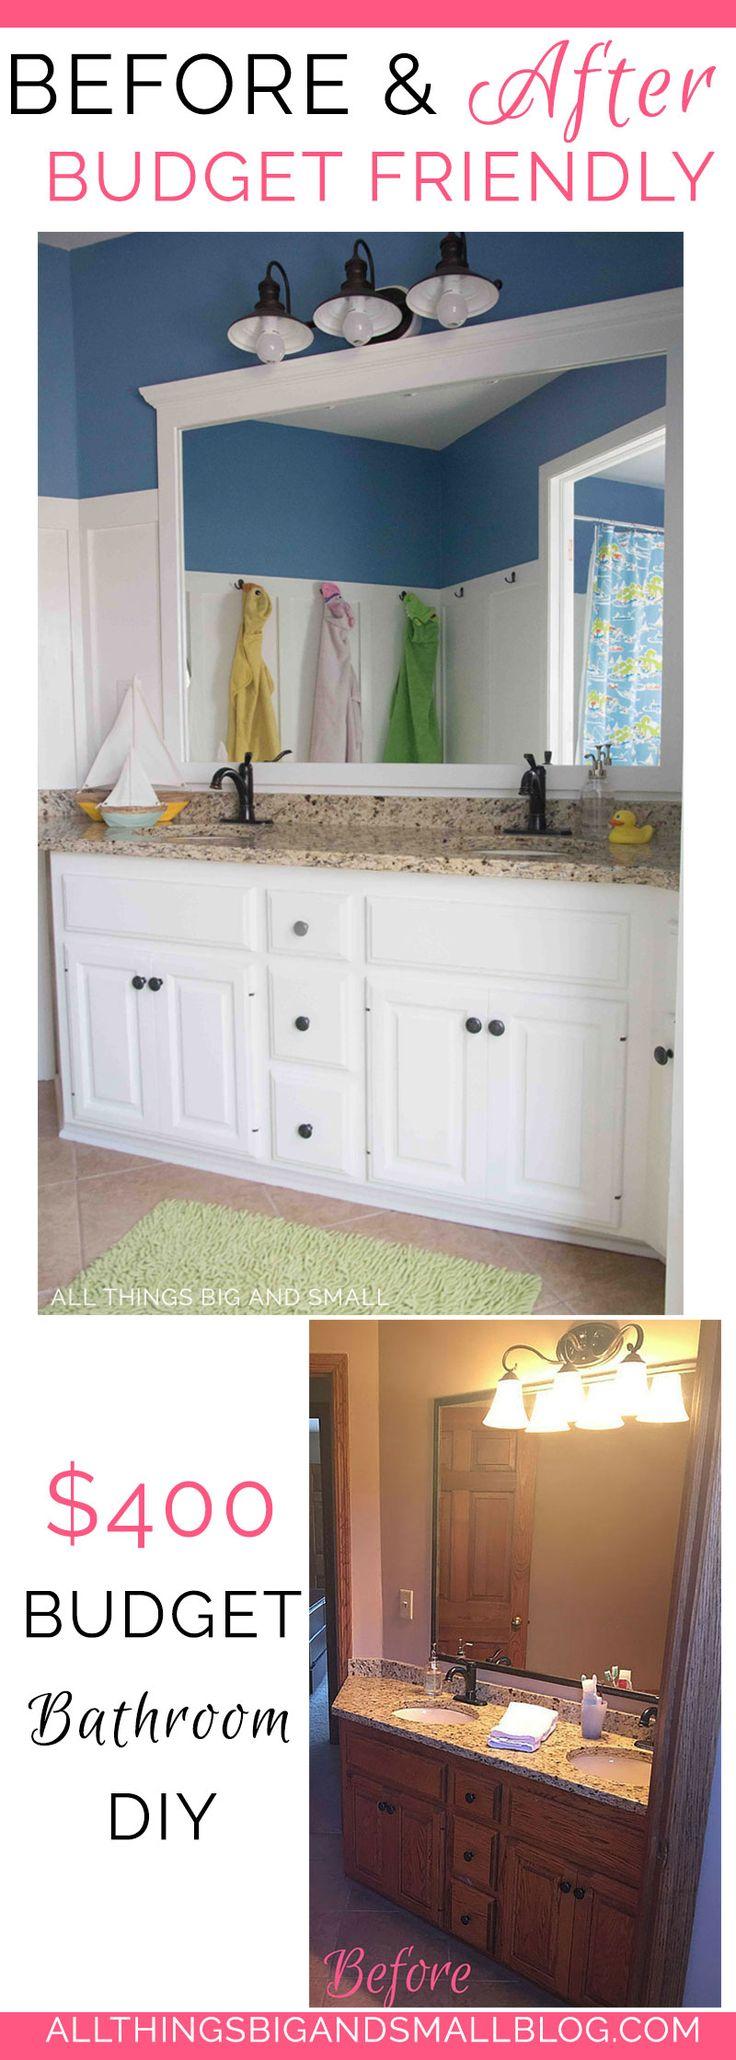 budget friendly bathroom | DIY bathroom | How to Paint Cabinets | Bathroom DIY | ALL THINGS BIG AND SMALL